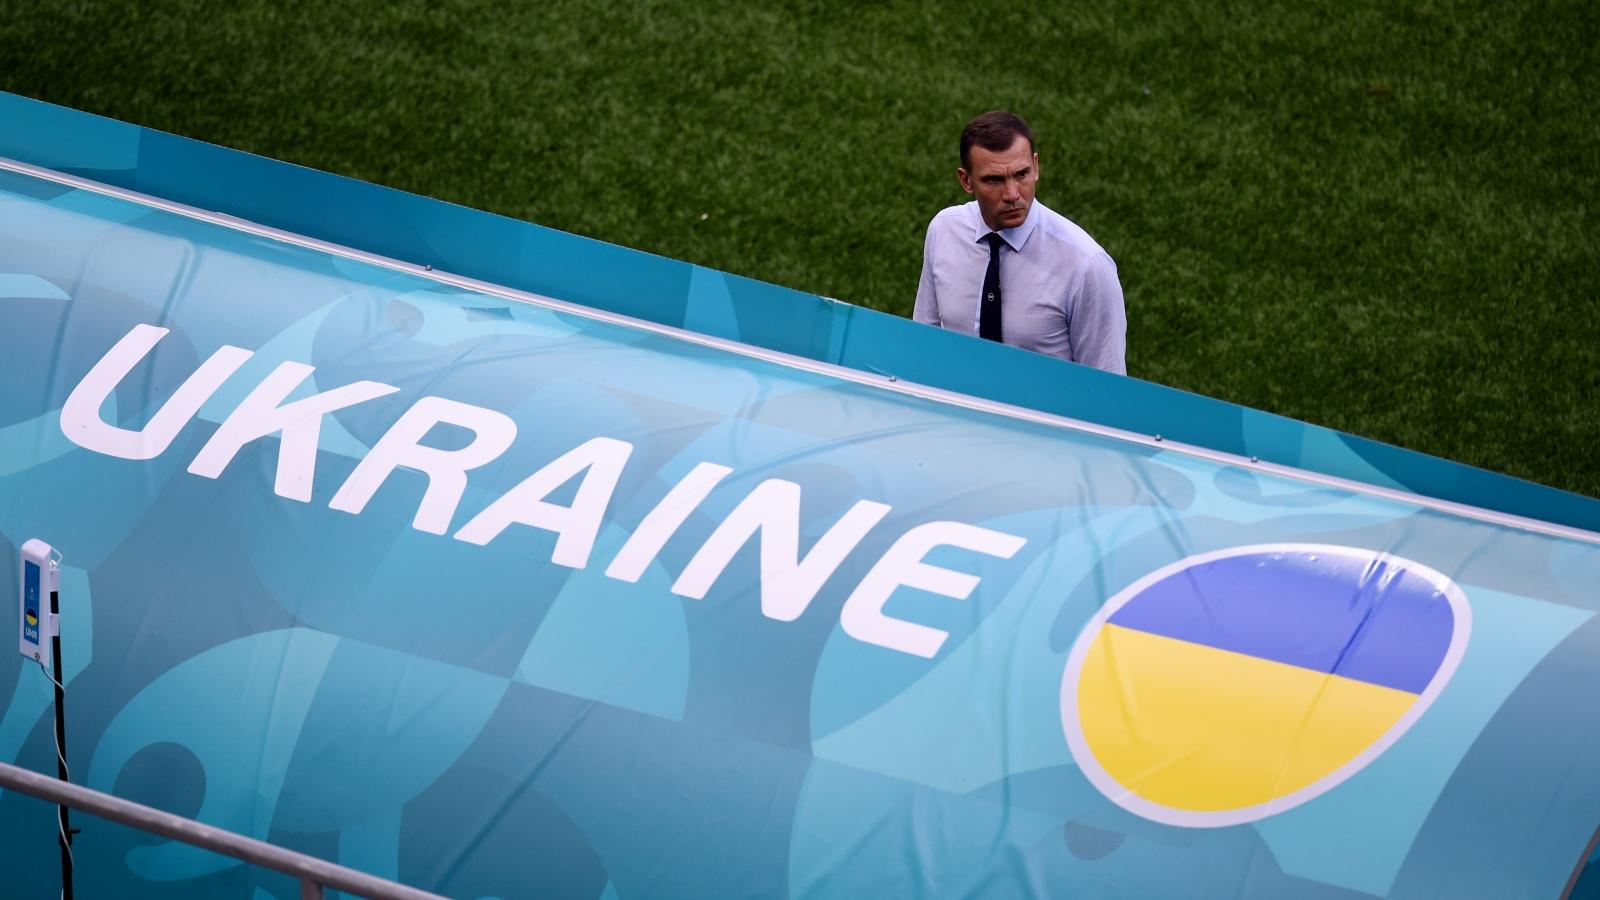 Trực tiếp Ukraine 0-1 Áo: HLV Shevchenko bất lực